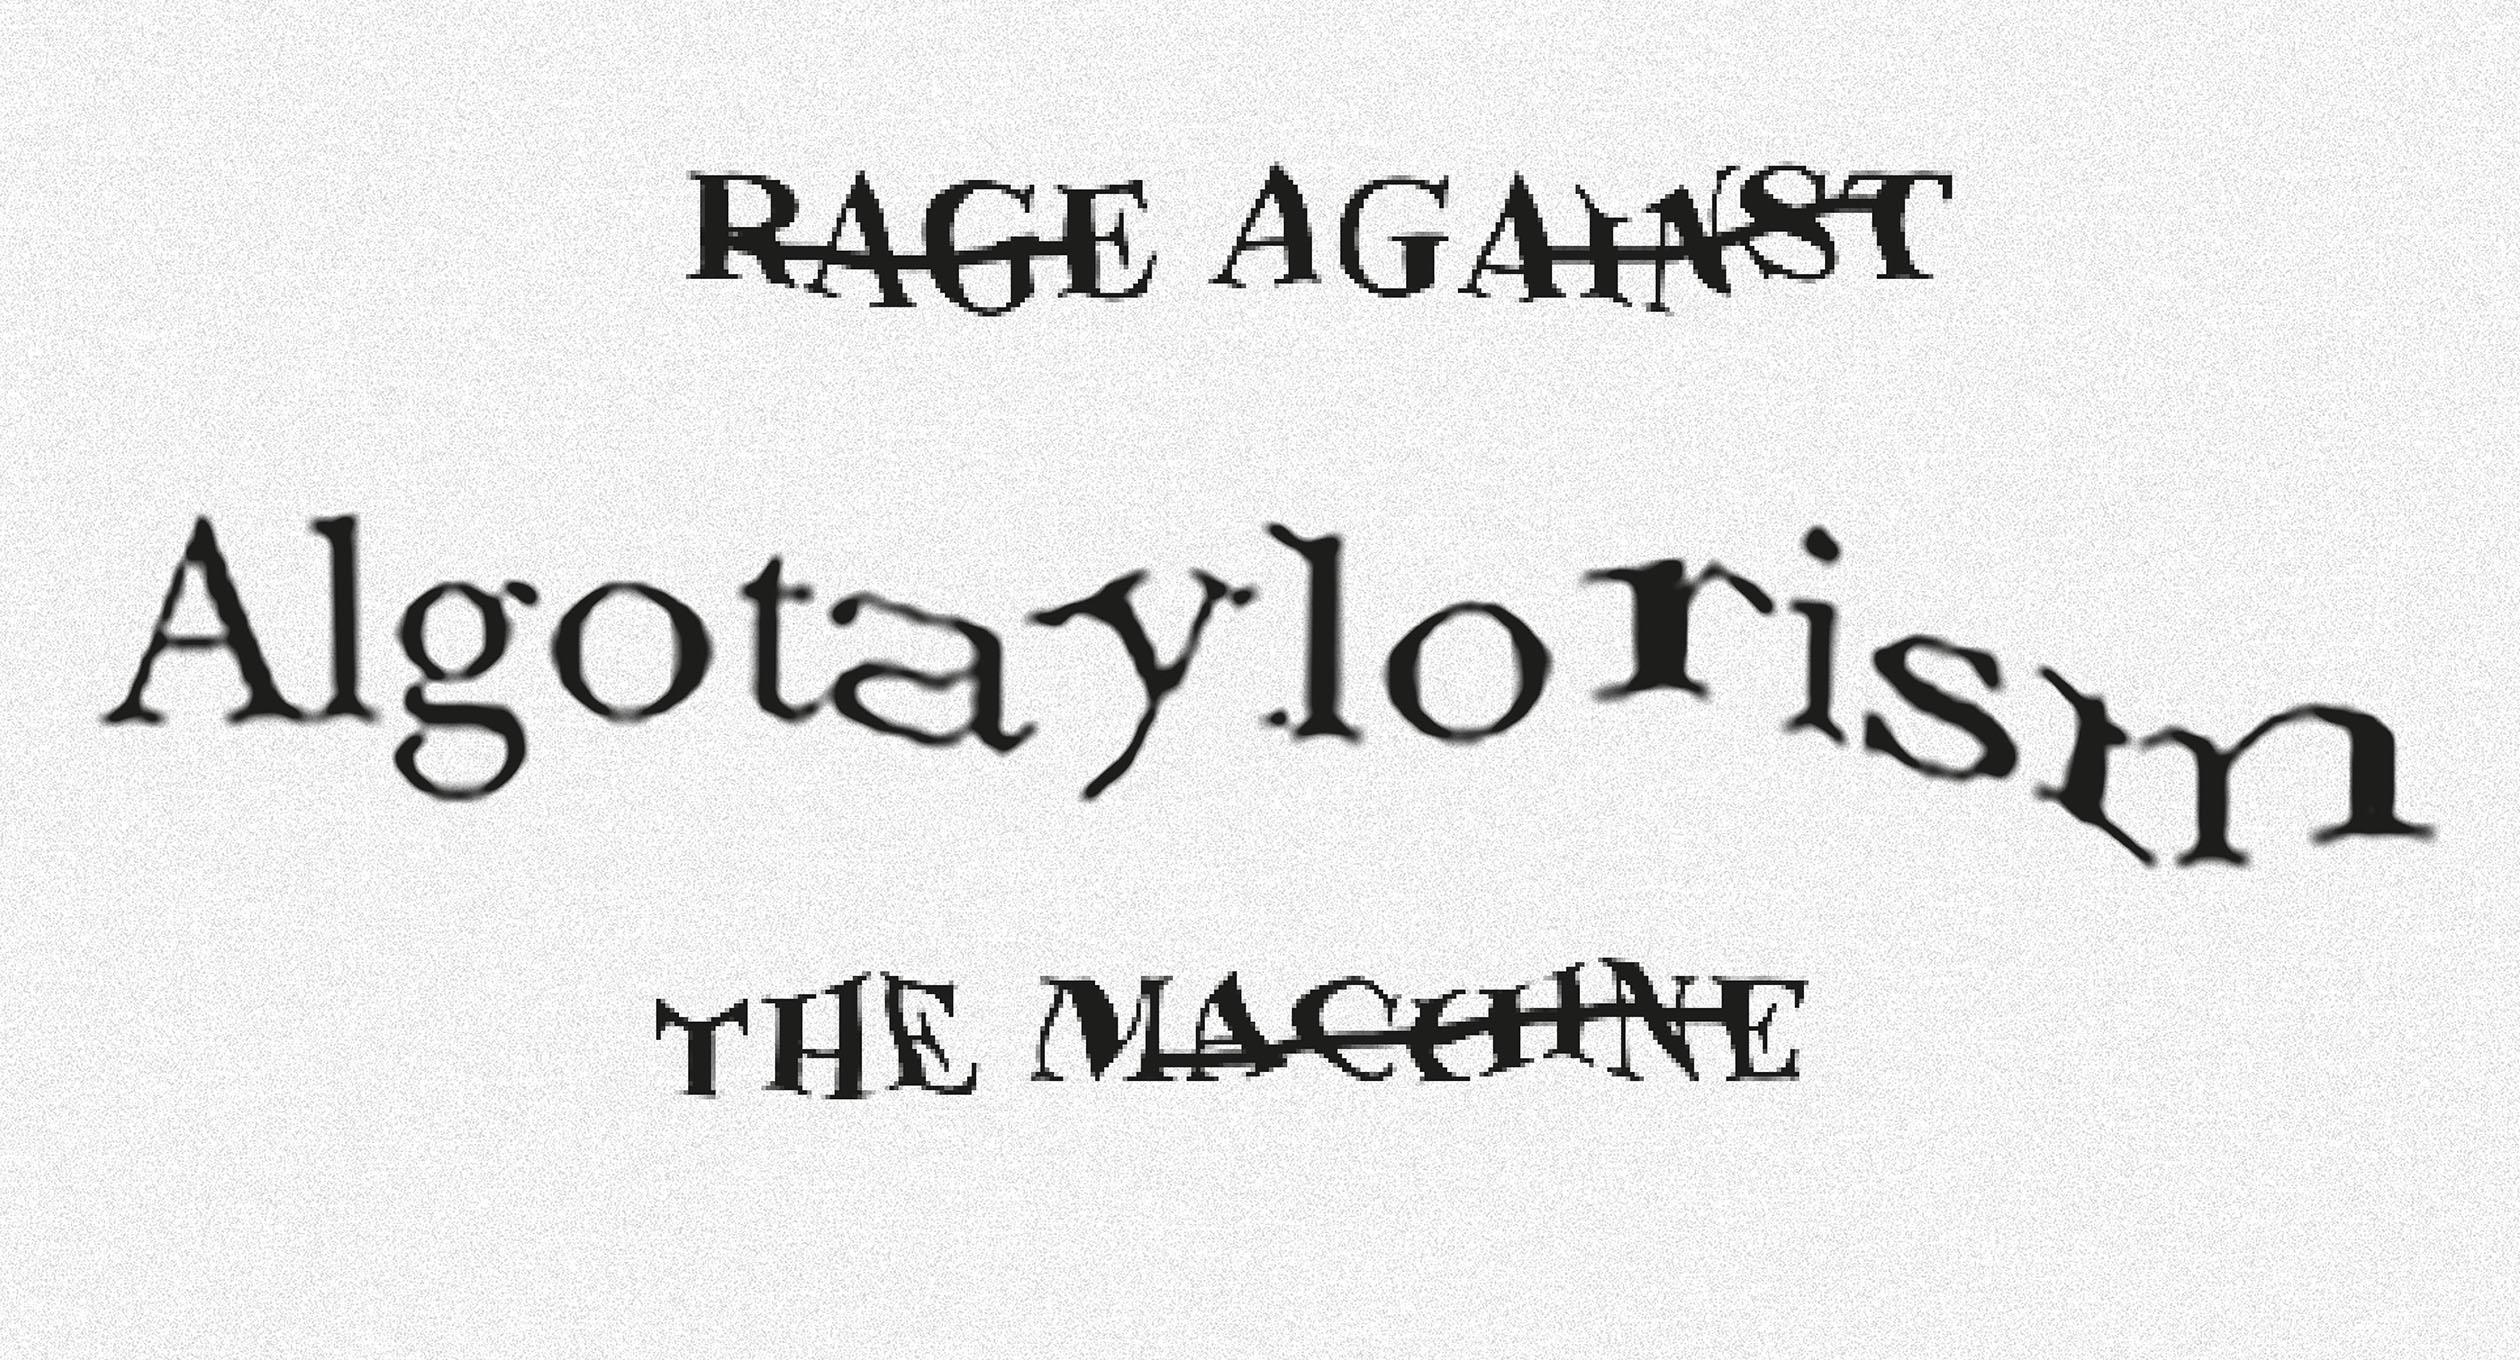 ALGOTAYLORISM